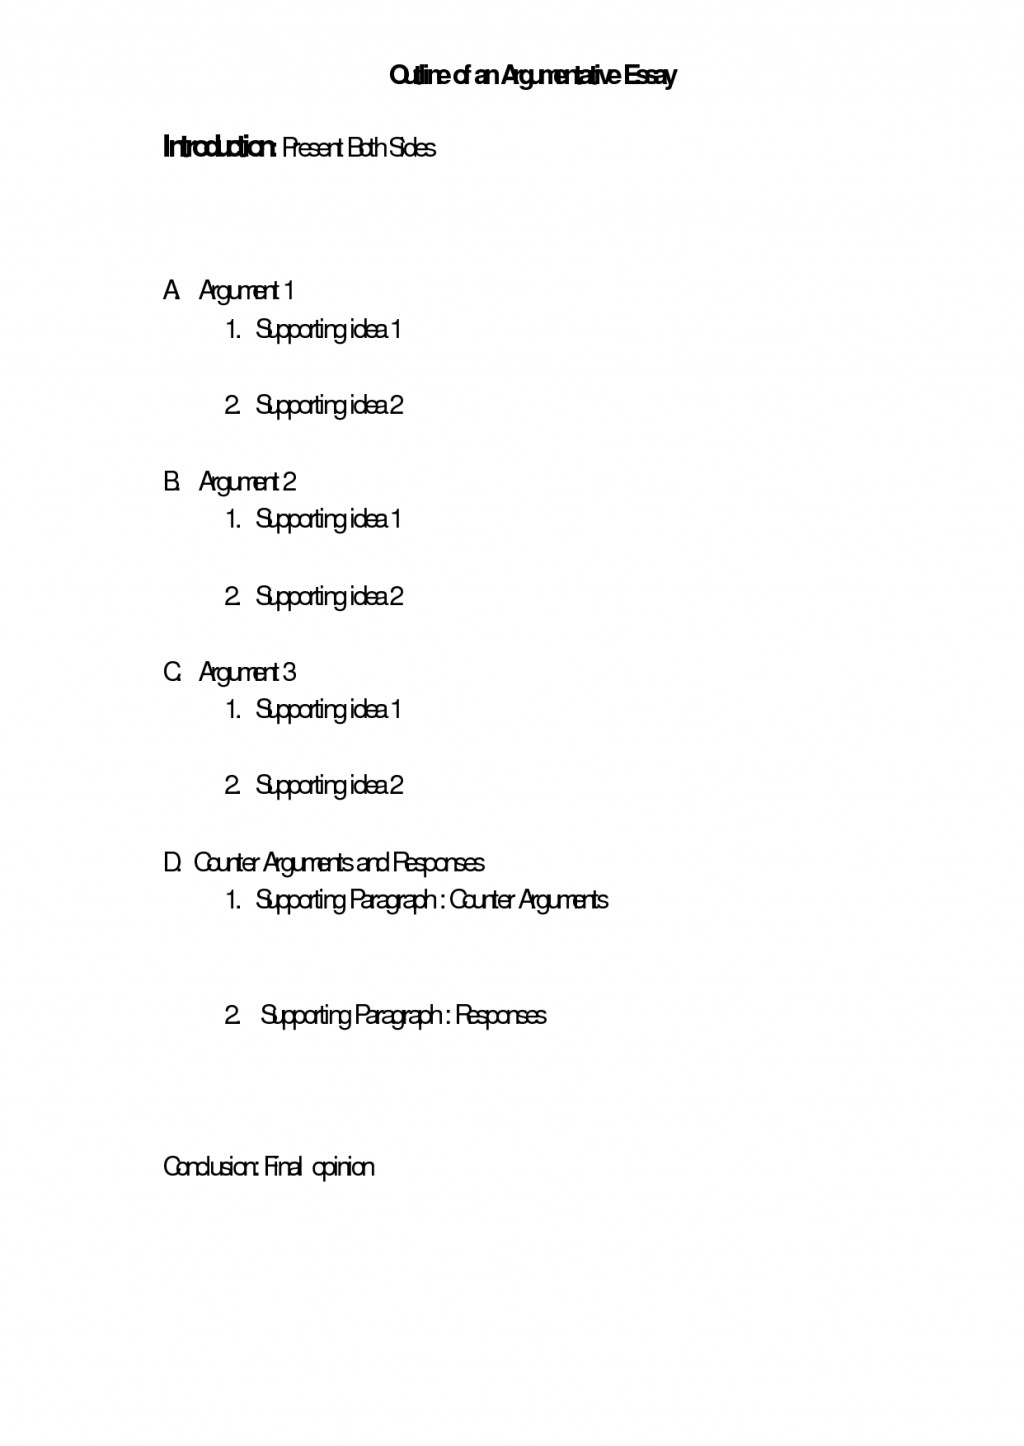 009 Argument Essay Outline Debate Goal Blockety Co Z4bas Argumentative Format Structure Mla Remarkable Sample 5 Paragraph Template Blank Large